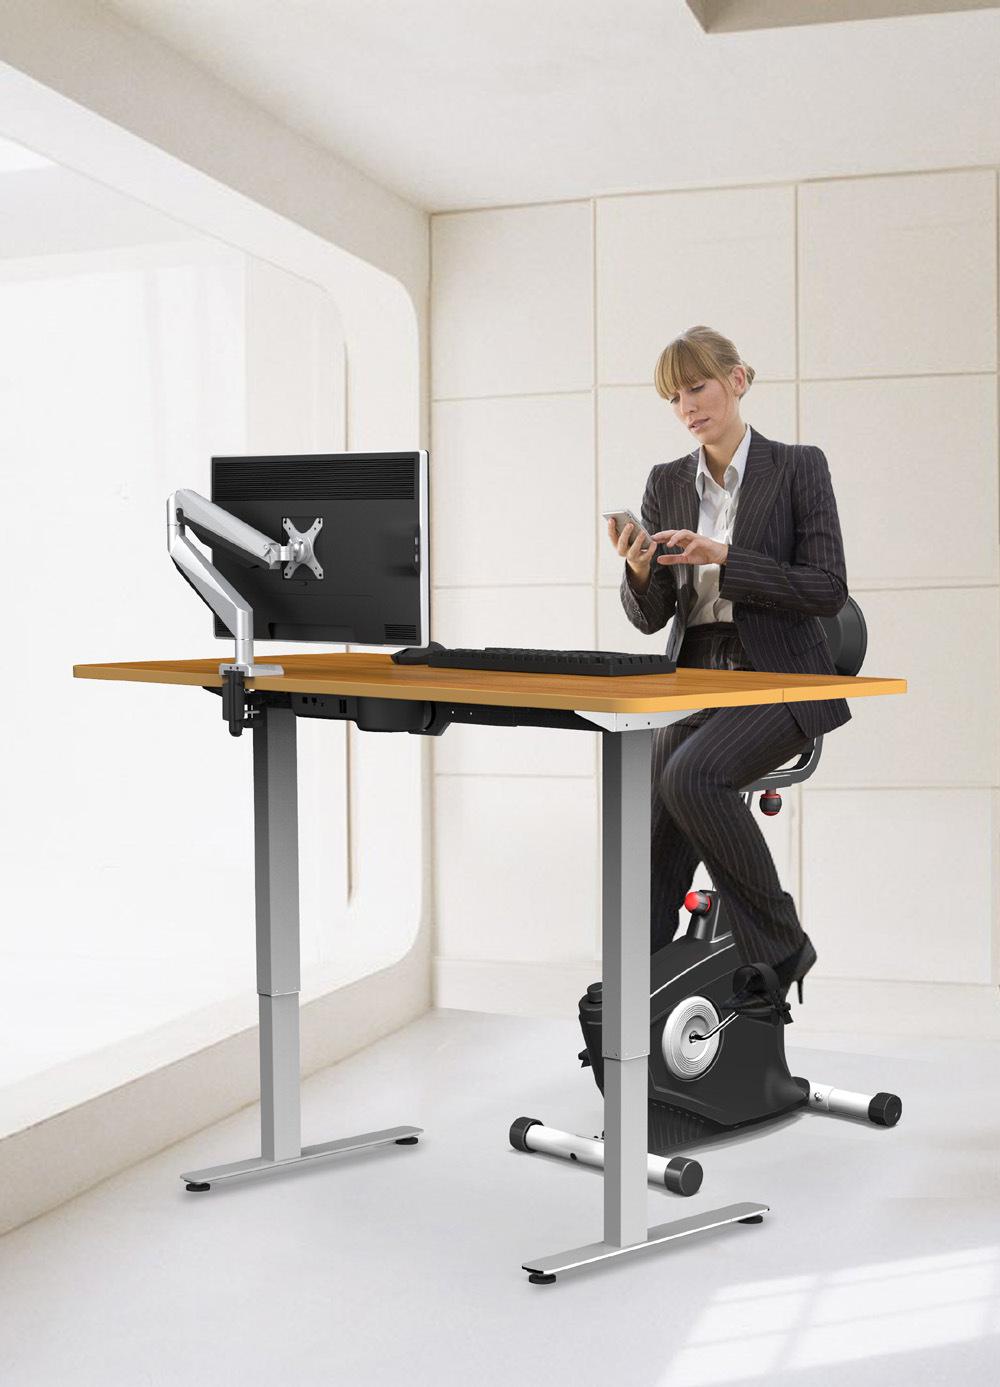 China New Office Wellness Under Desk Exercise Upright Cycle Bike Exerciser